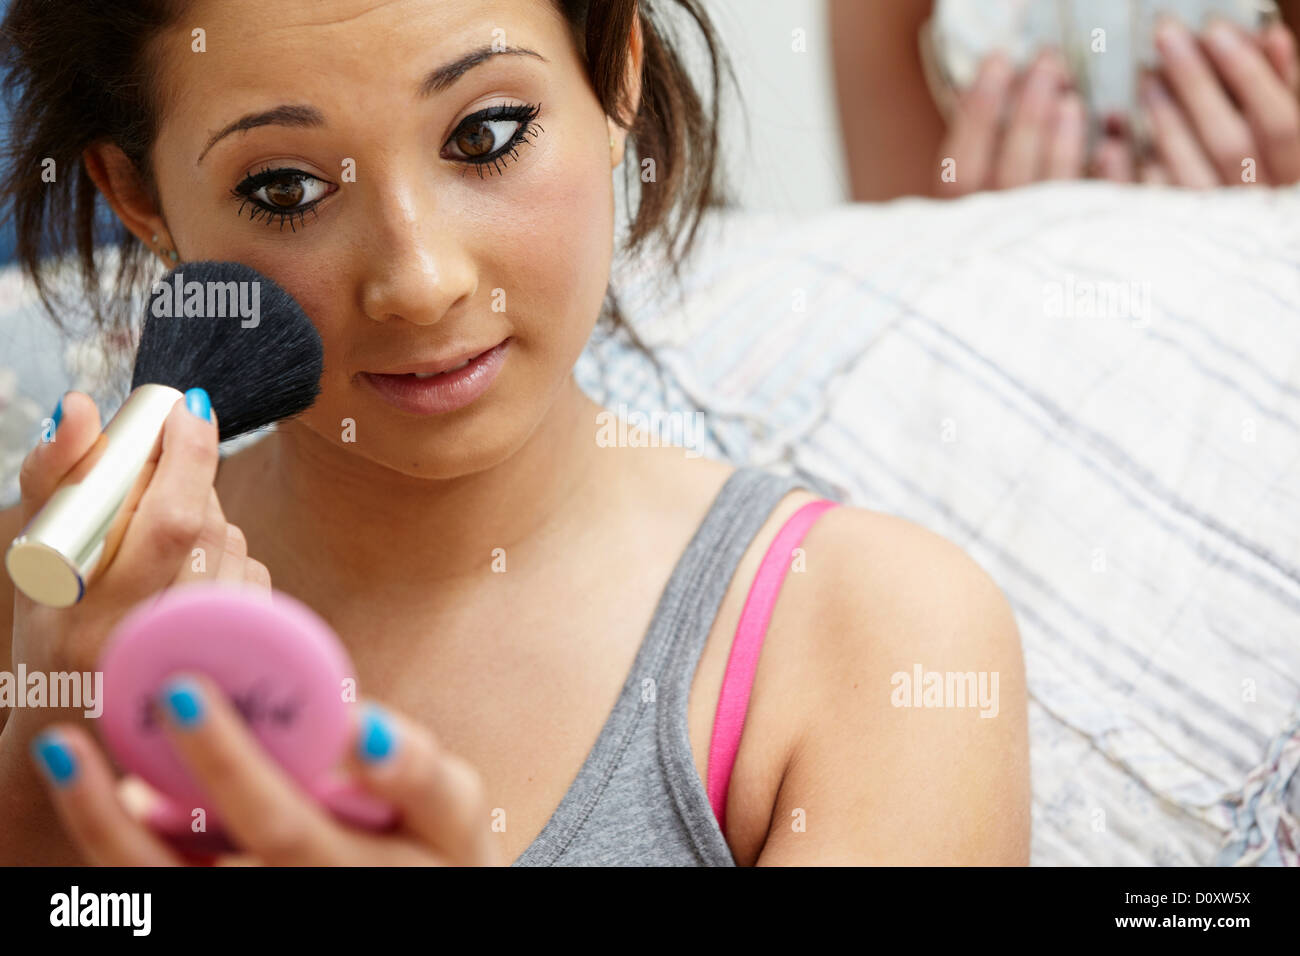 Teenager-Mädchen Schminken Stockfoto